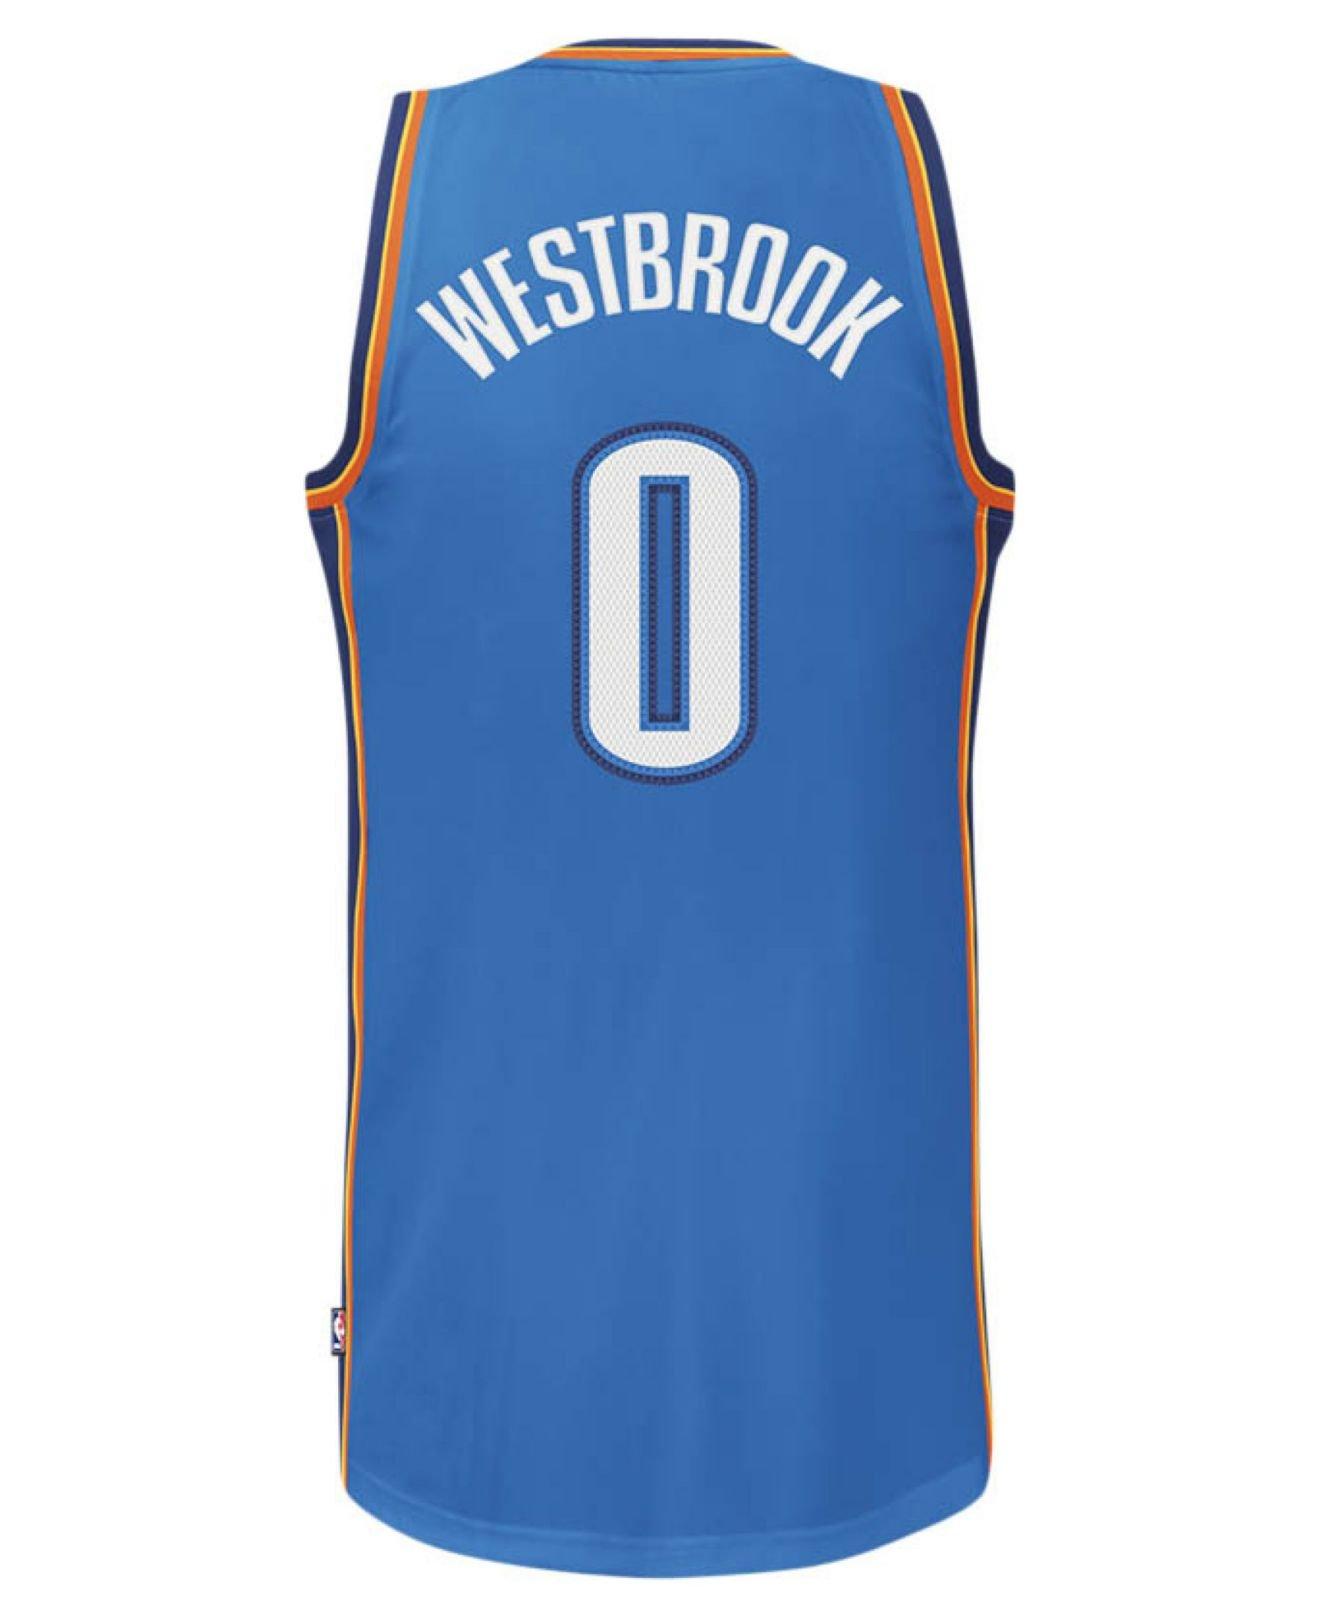 7a5fee0ba621f6 ... australia lyst adidas mens oklahoma city thunder russell westbrook  jersey 29a71 24aab